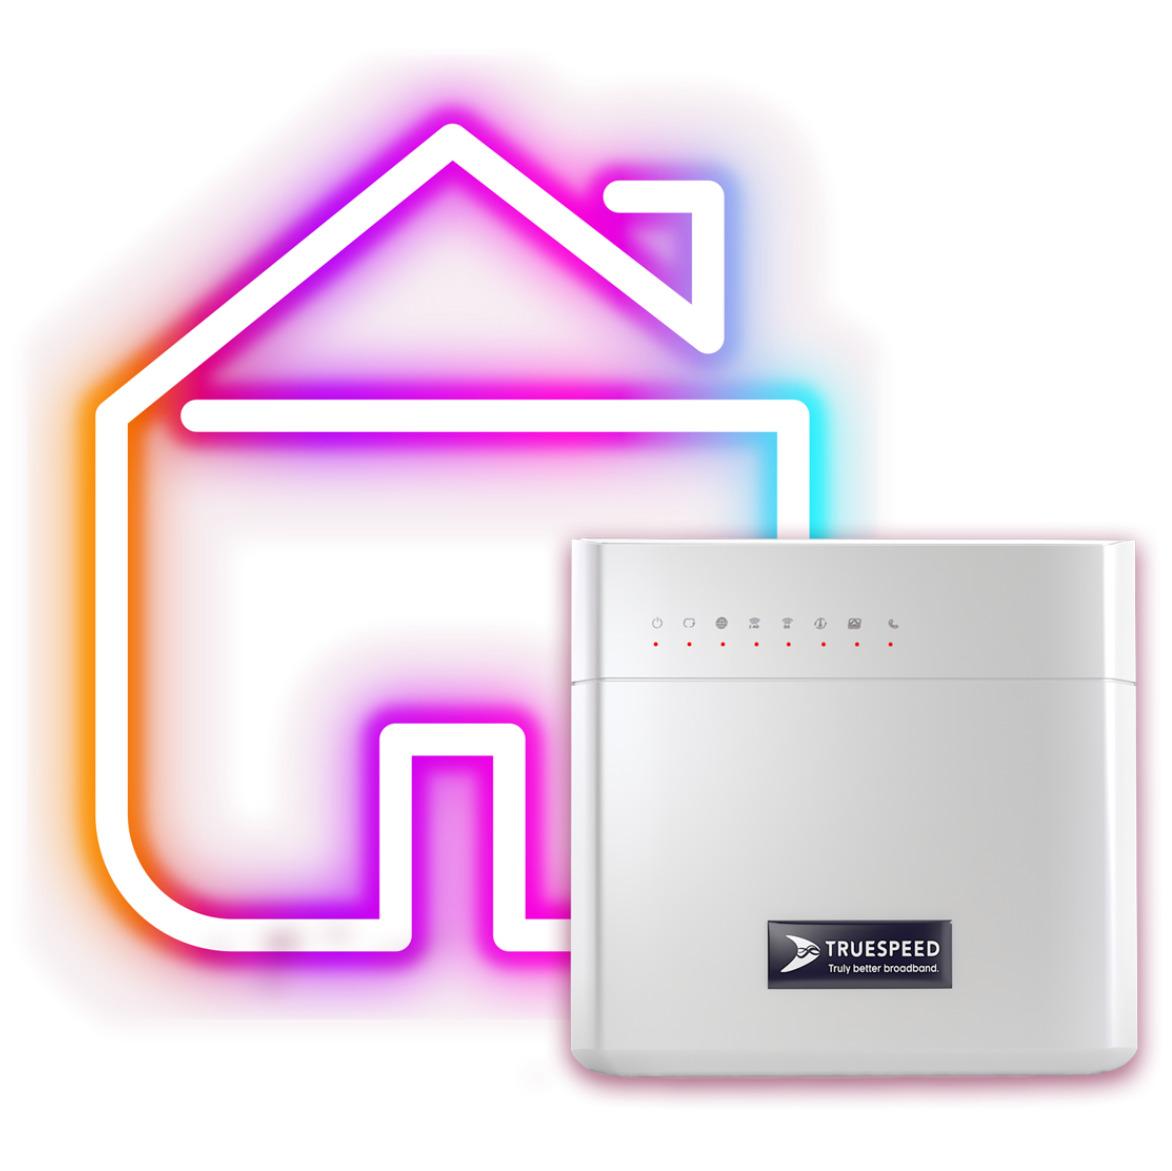 truespeed_router